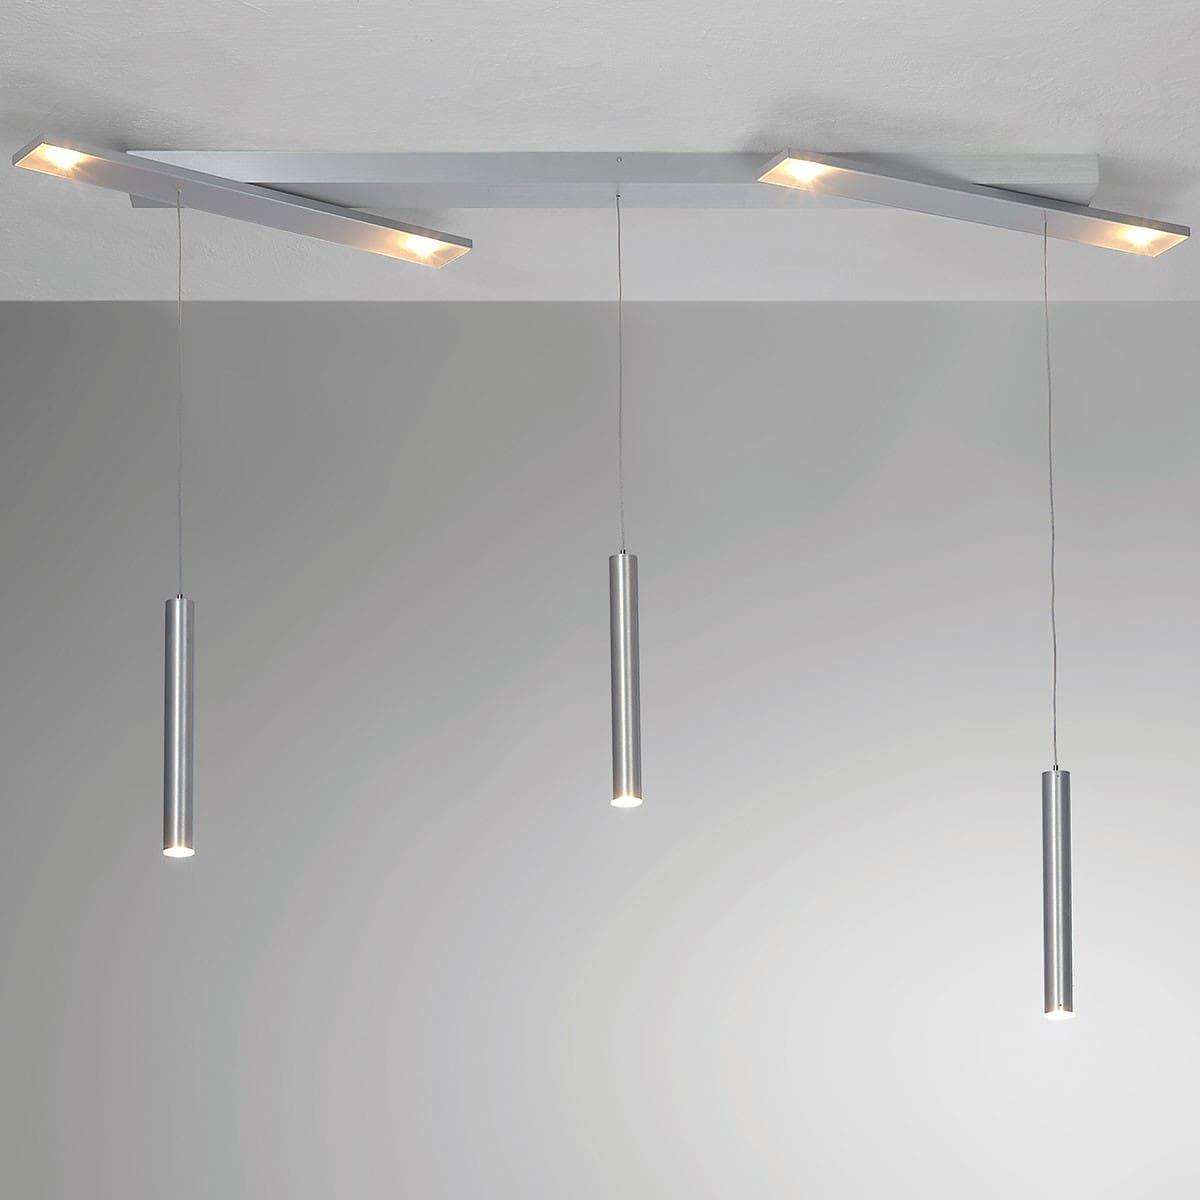 Bopp Plus Led Pendelleuchte 7 Flg Aluminium Geschliffen Led Pendelleuchte Pendelleuchte Stehlampe Dimmbar